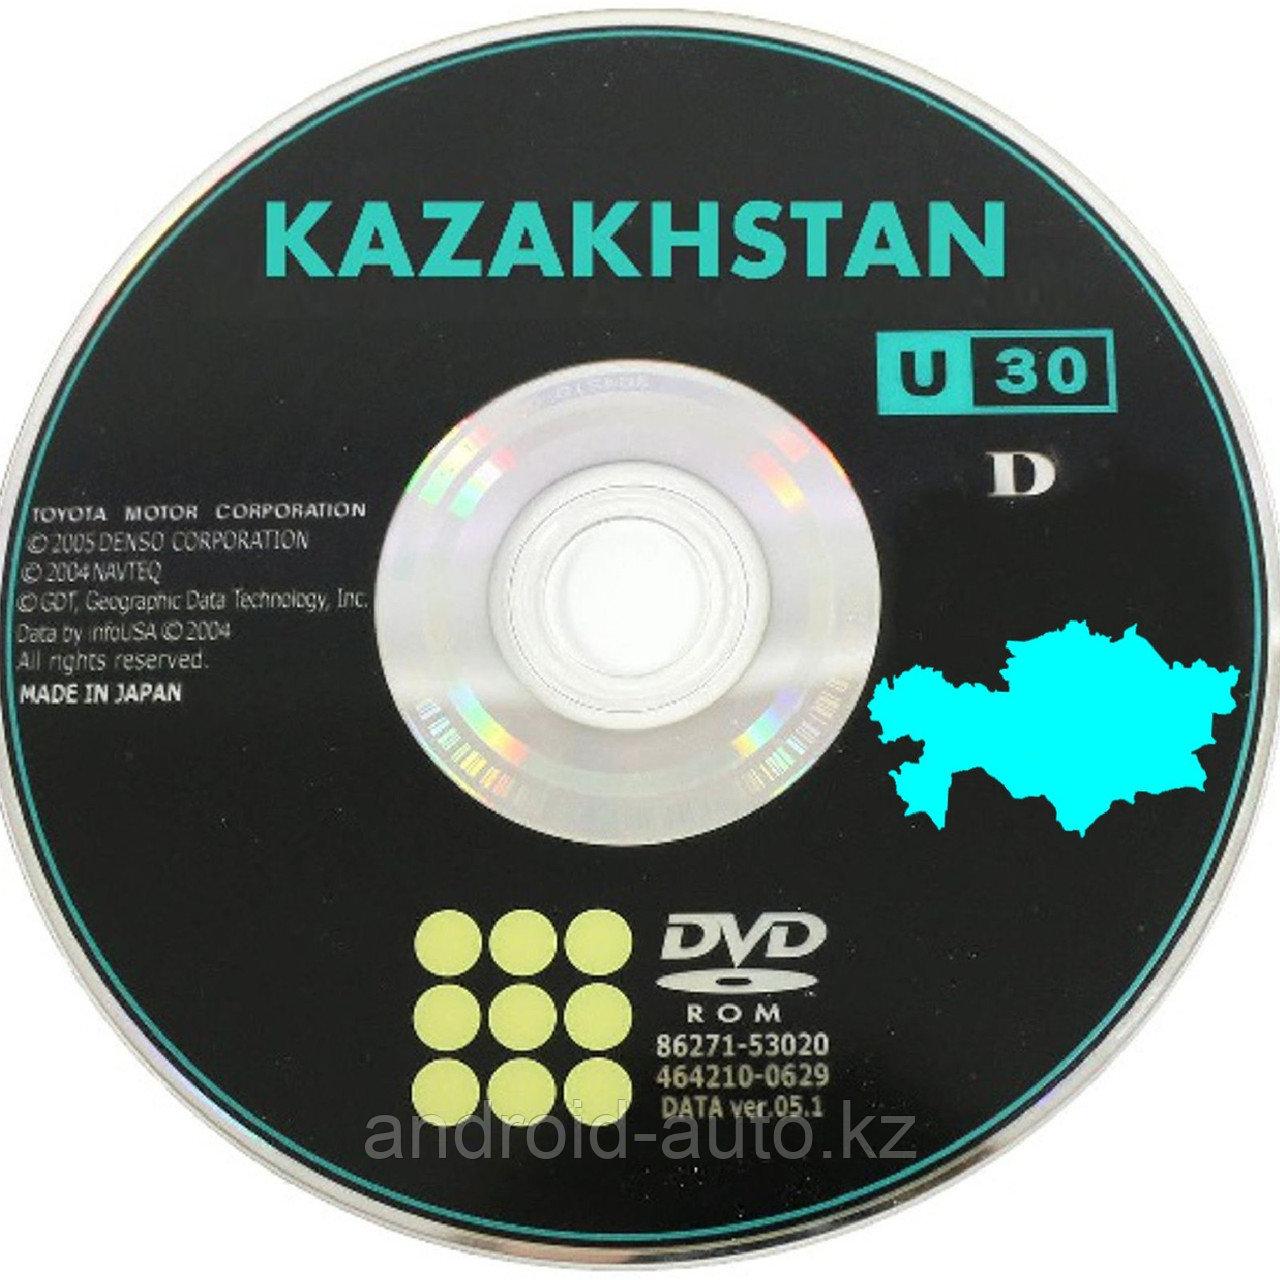 GEN-4 DVD NAVIGATION MAP of KAZAKHSTAN - (DENSO) TOYOTA Highlander 2001-2007